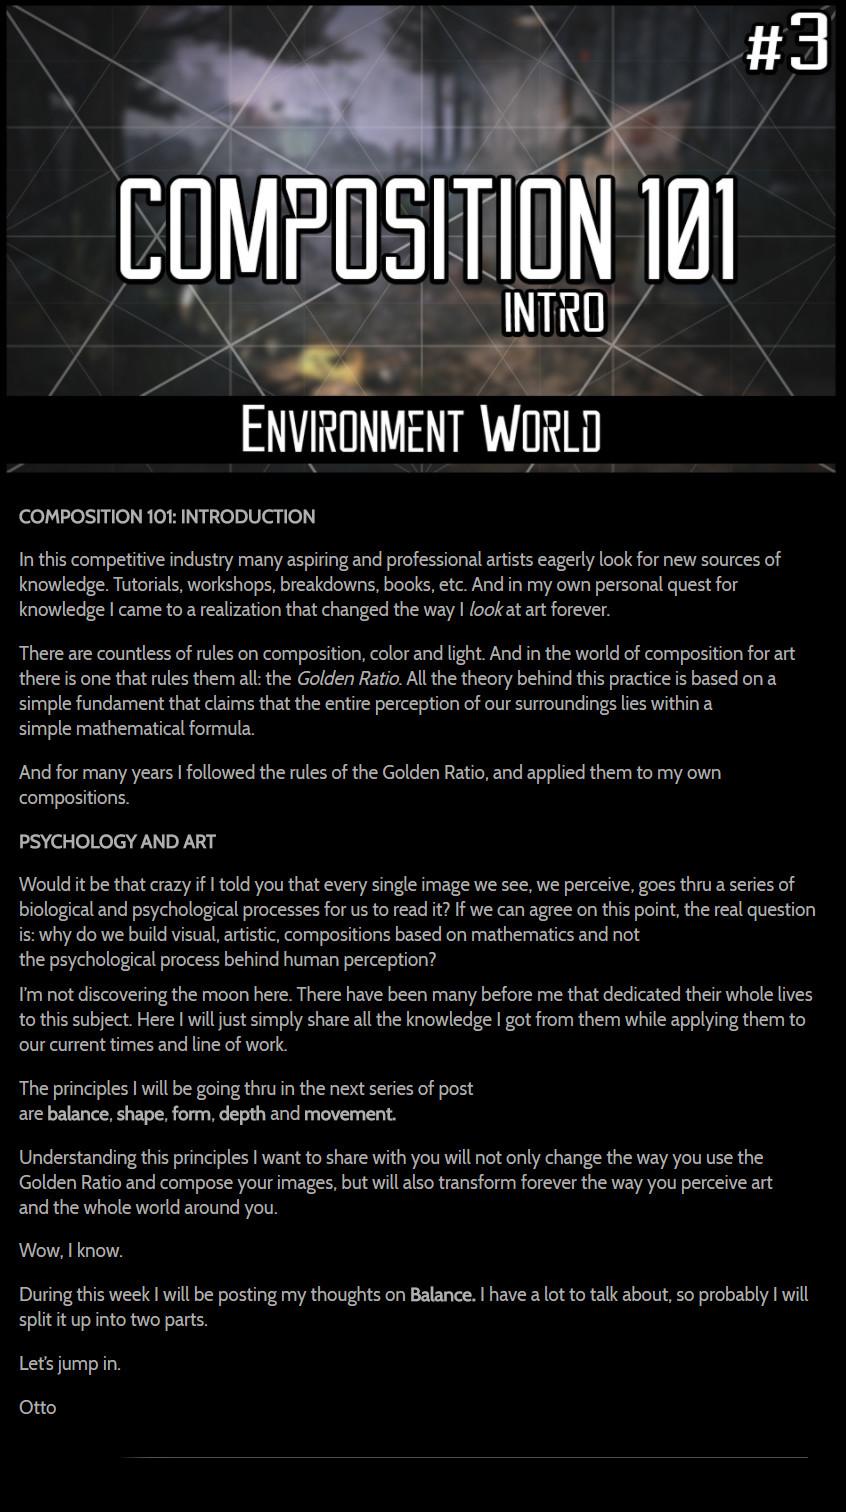 Otto ostera 01 otto ostera environment world 3 introduction composition101